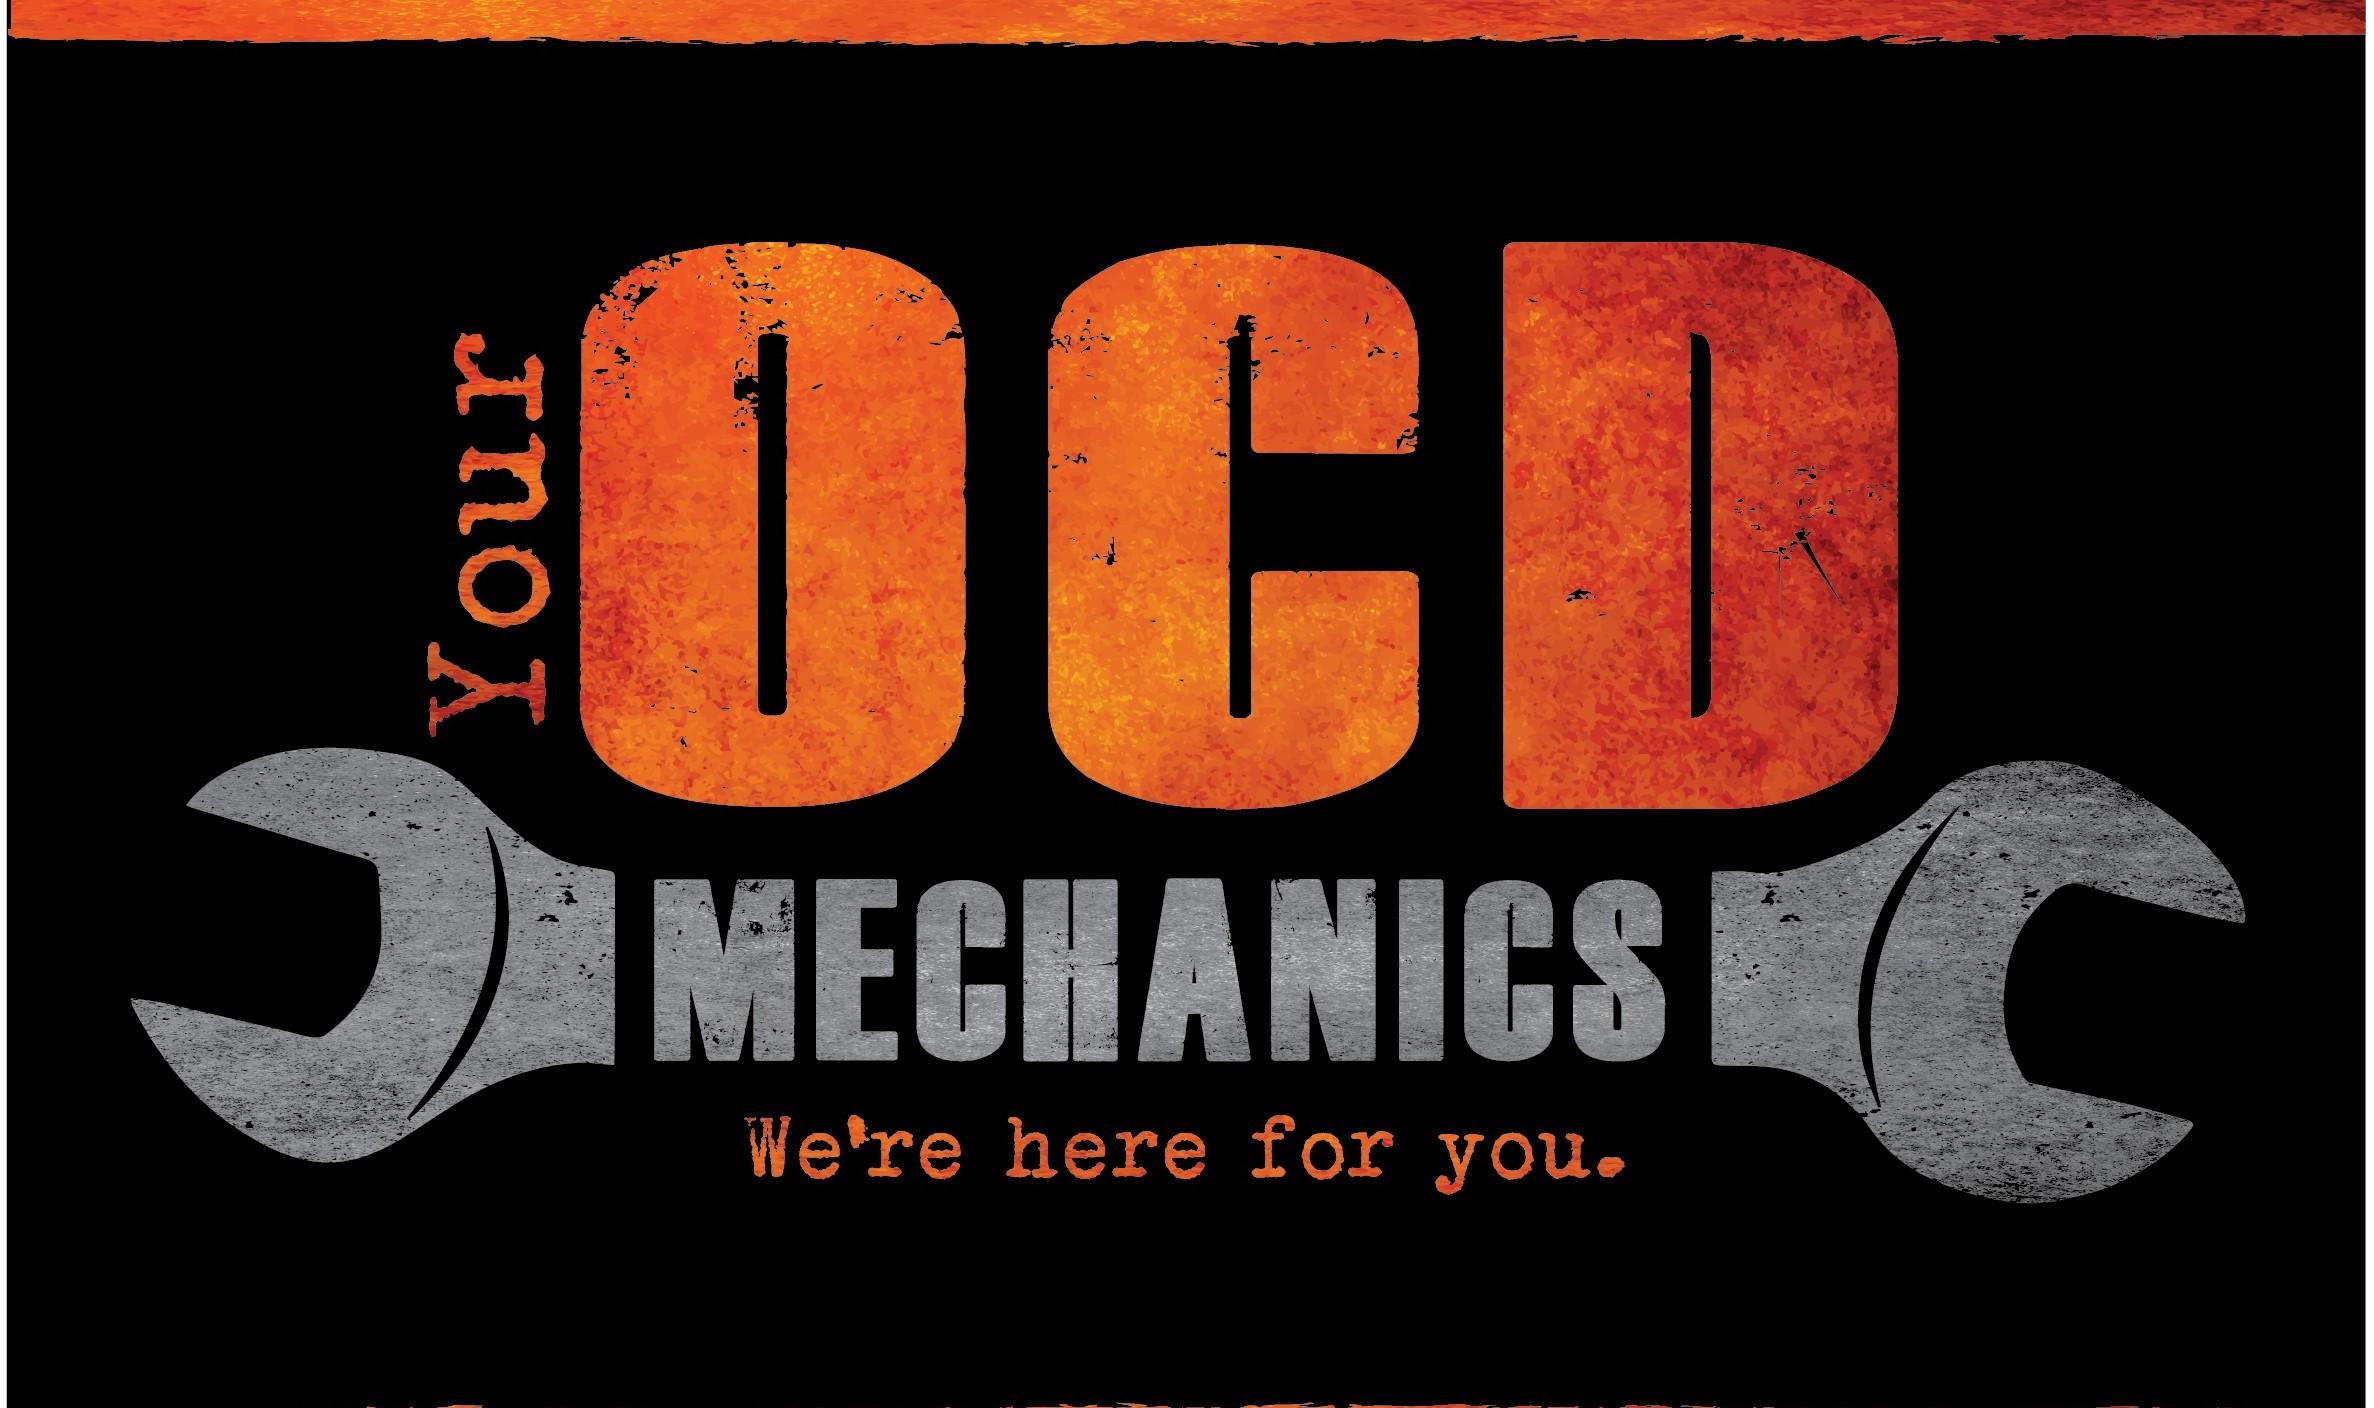 your-ocd-mechanics